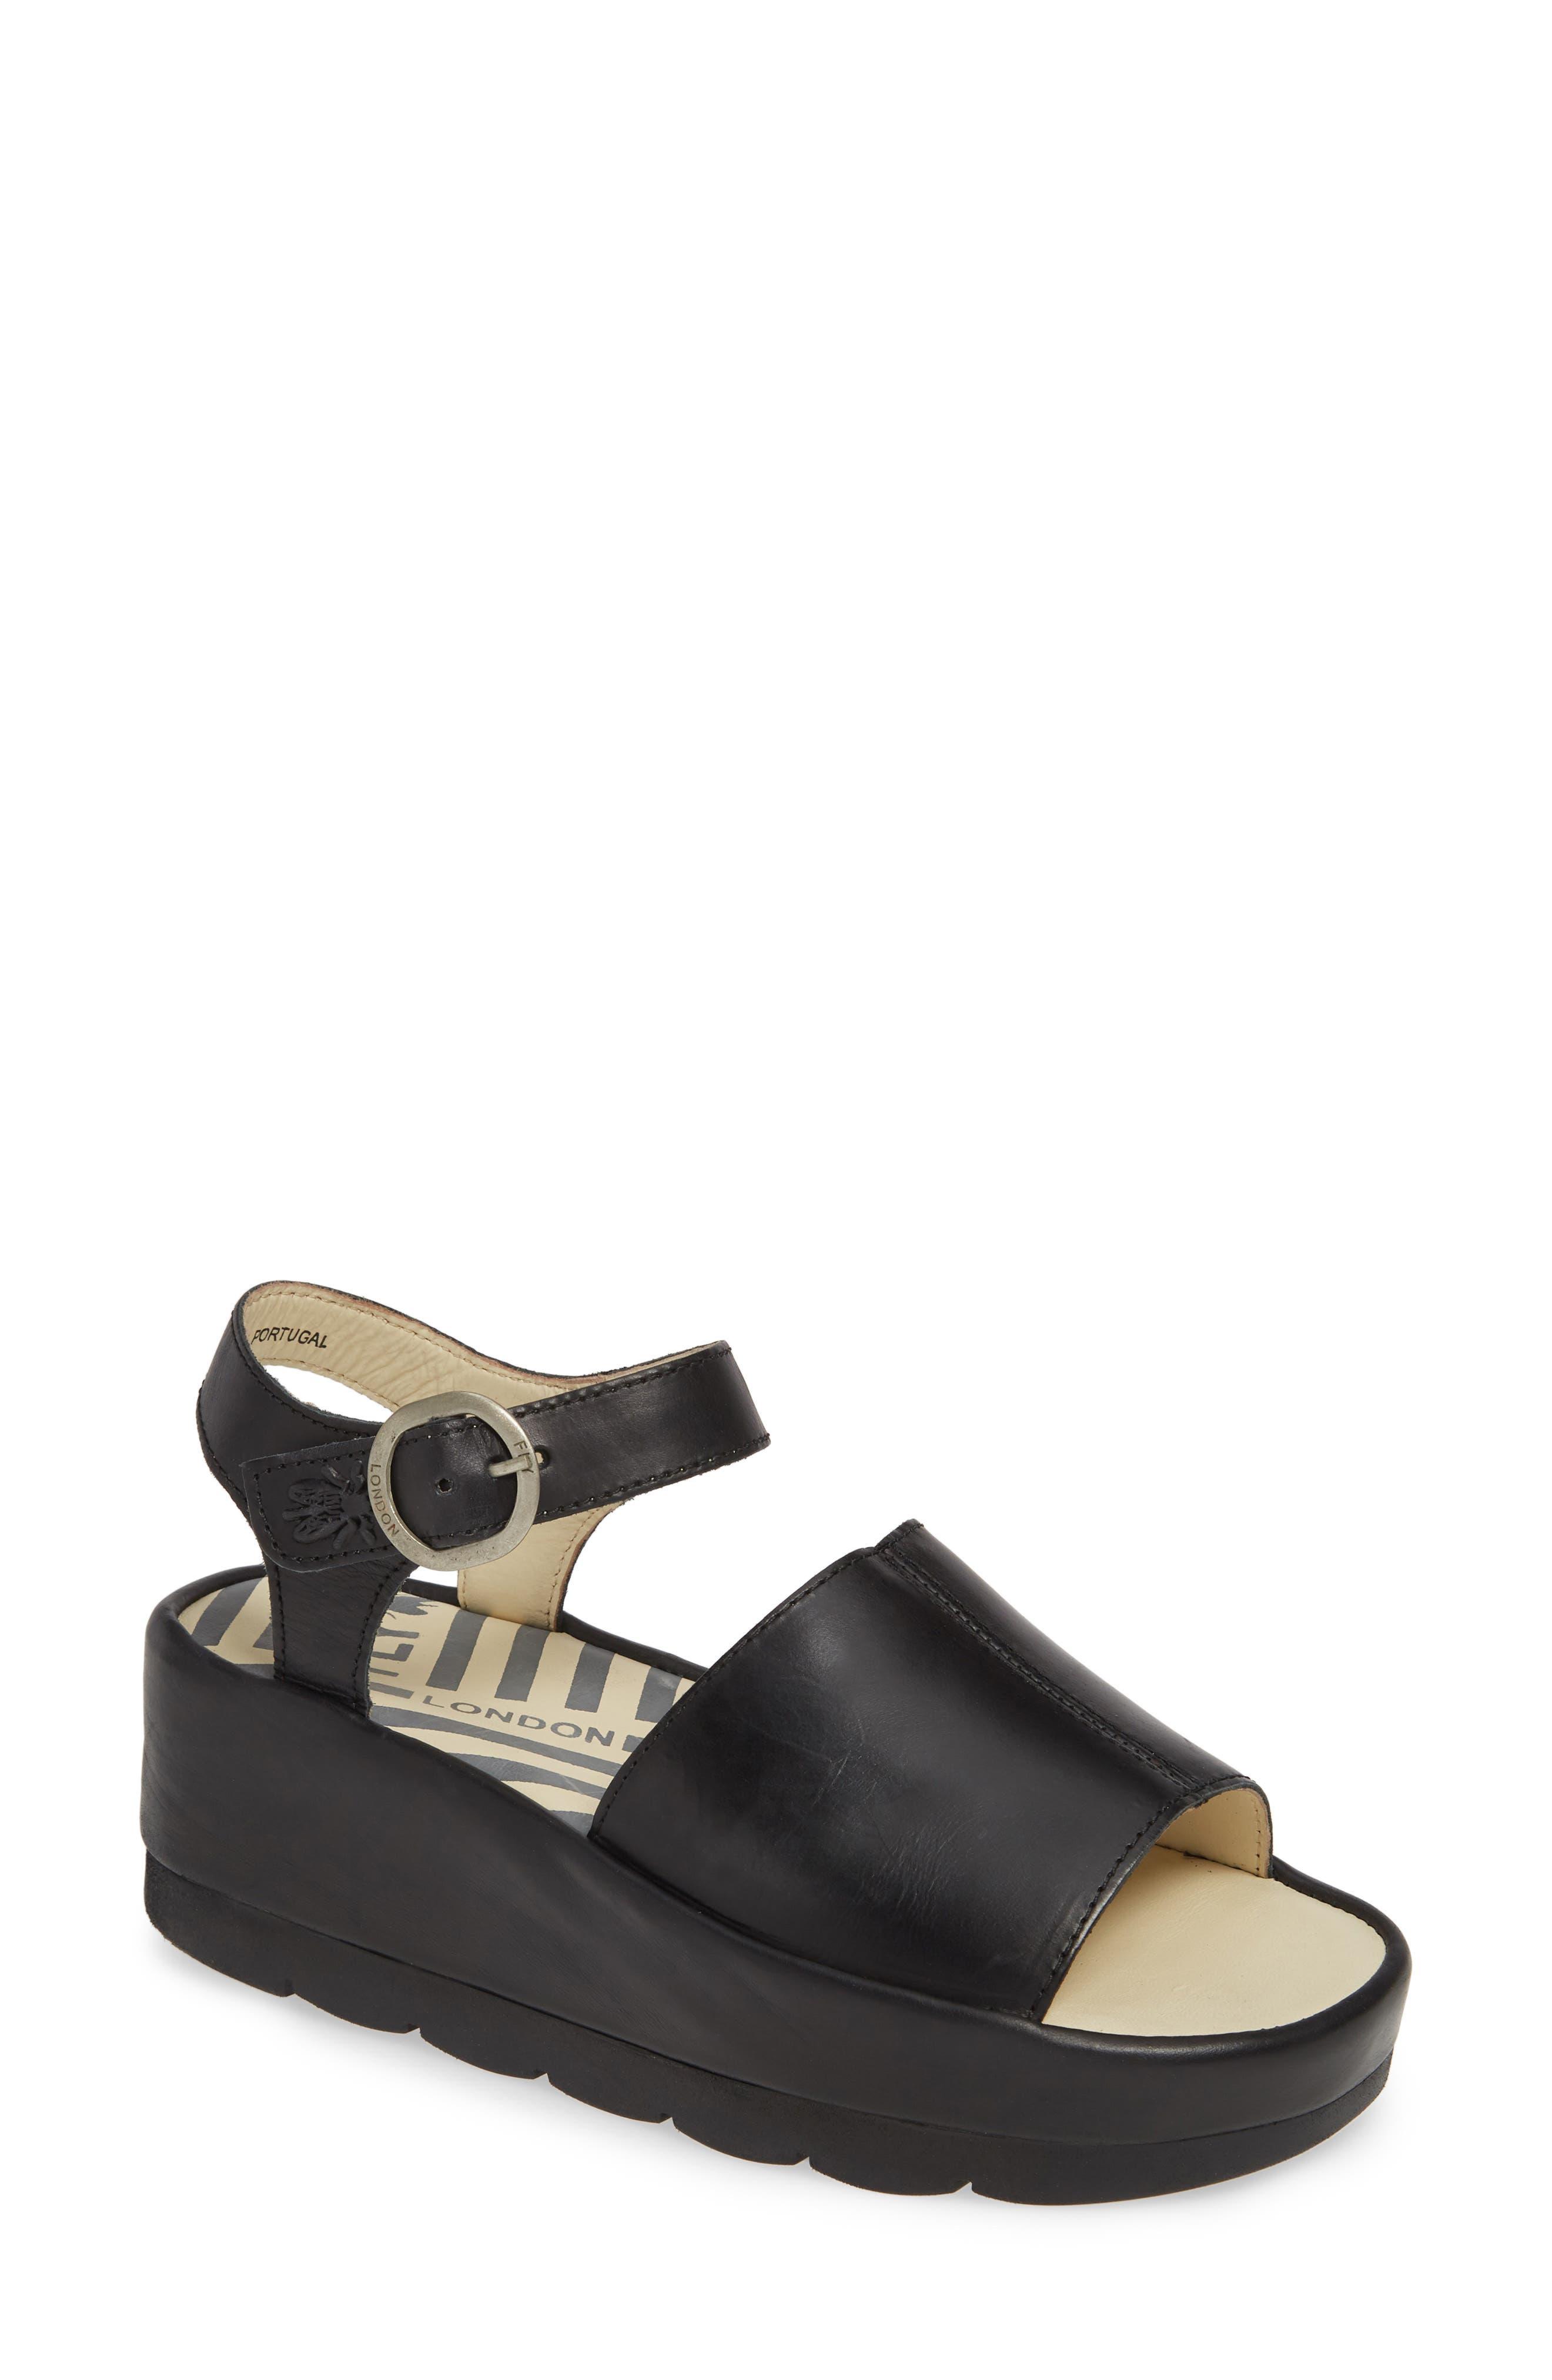 FLY LONDON Bano Platform Sandal, Main, color, BLACK LEATHER